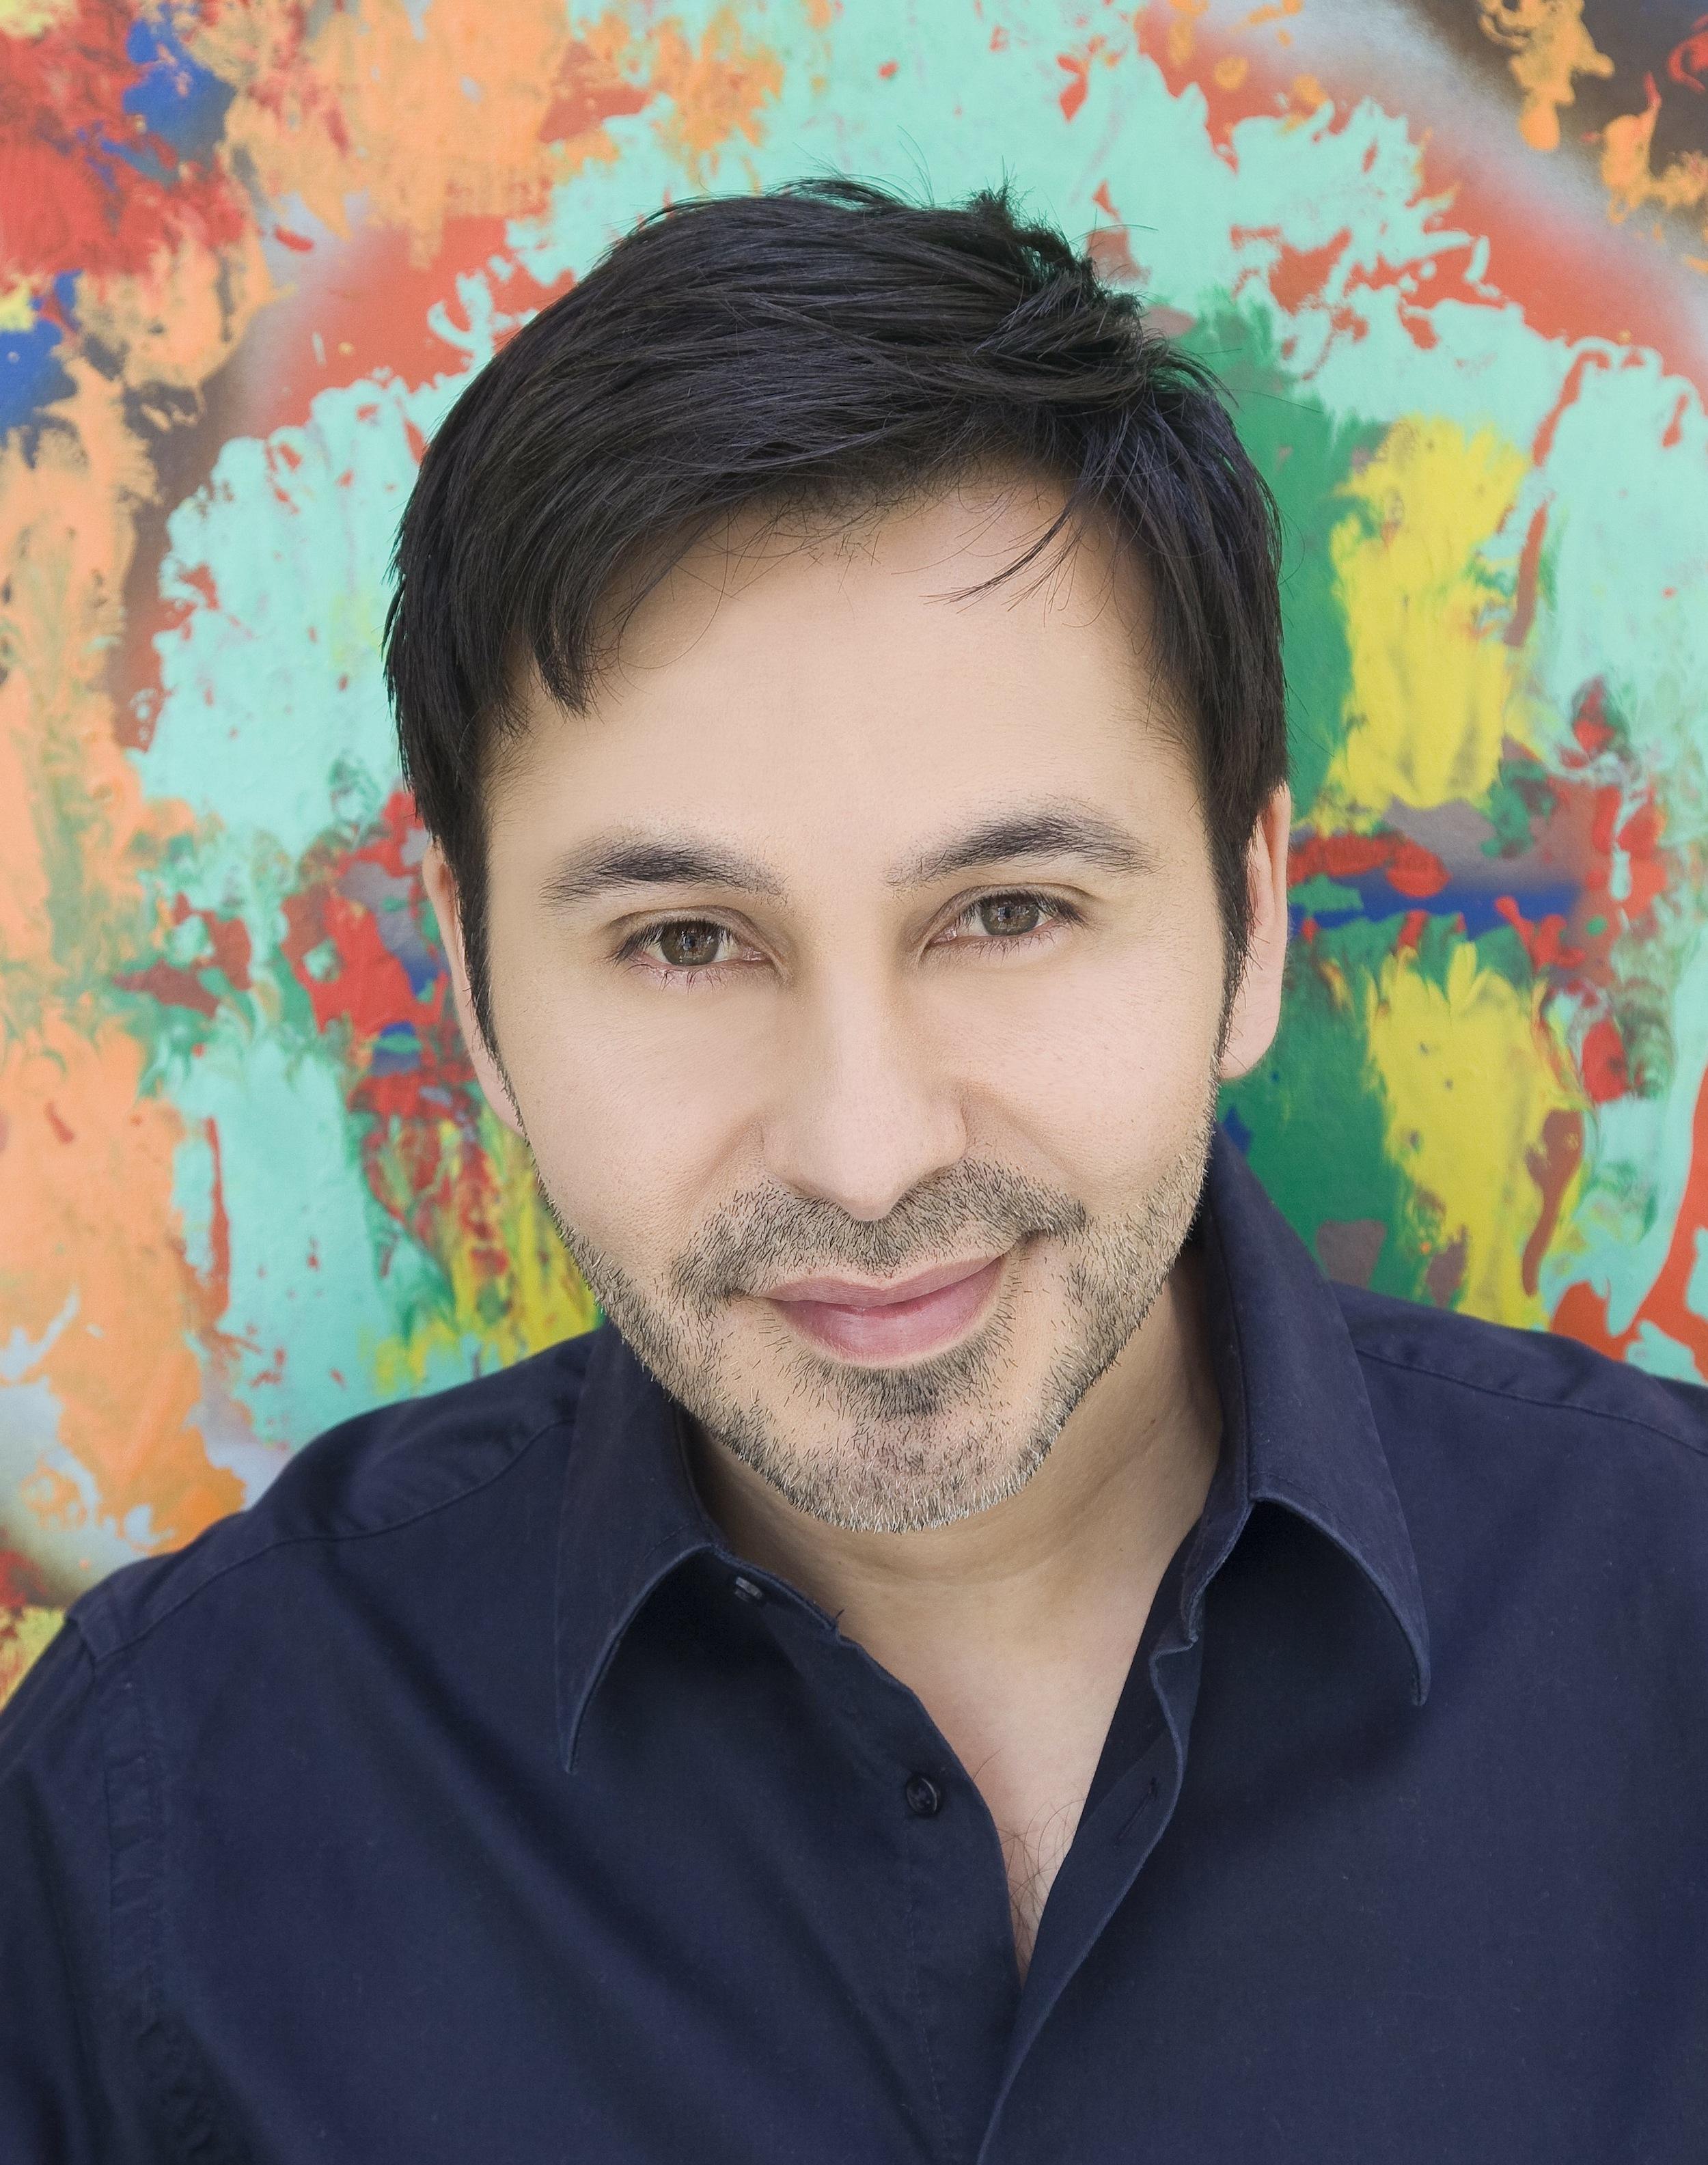 Make Your Mark With Mark Montano When Creativity Knocks